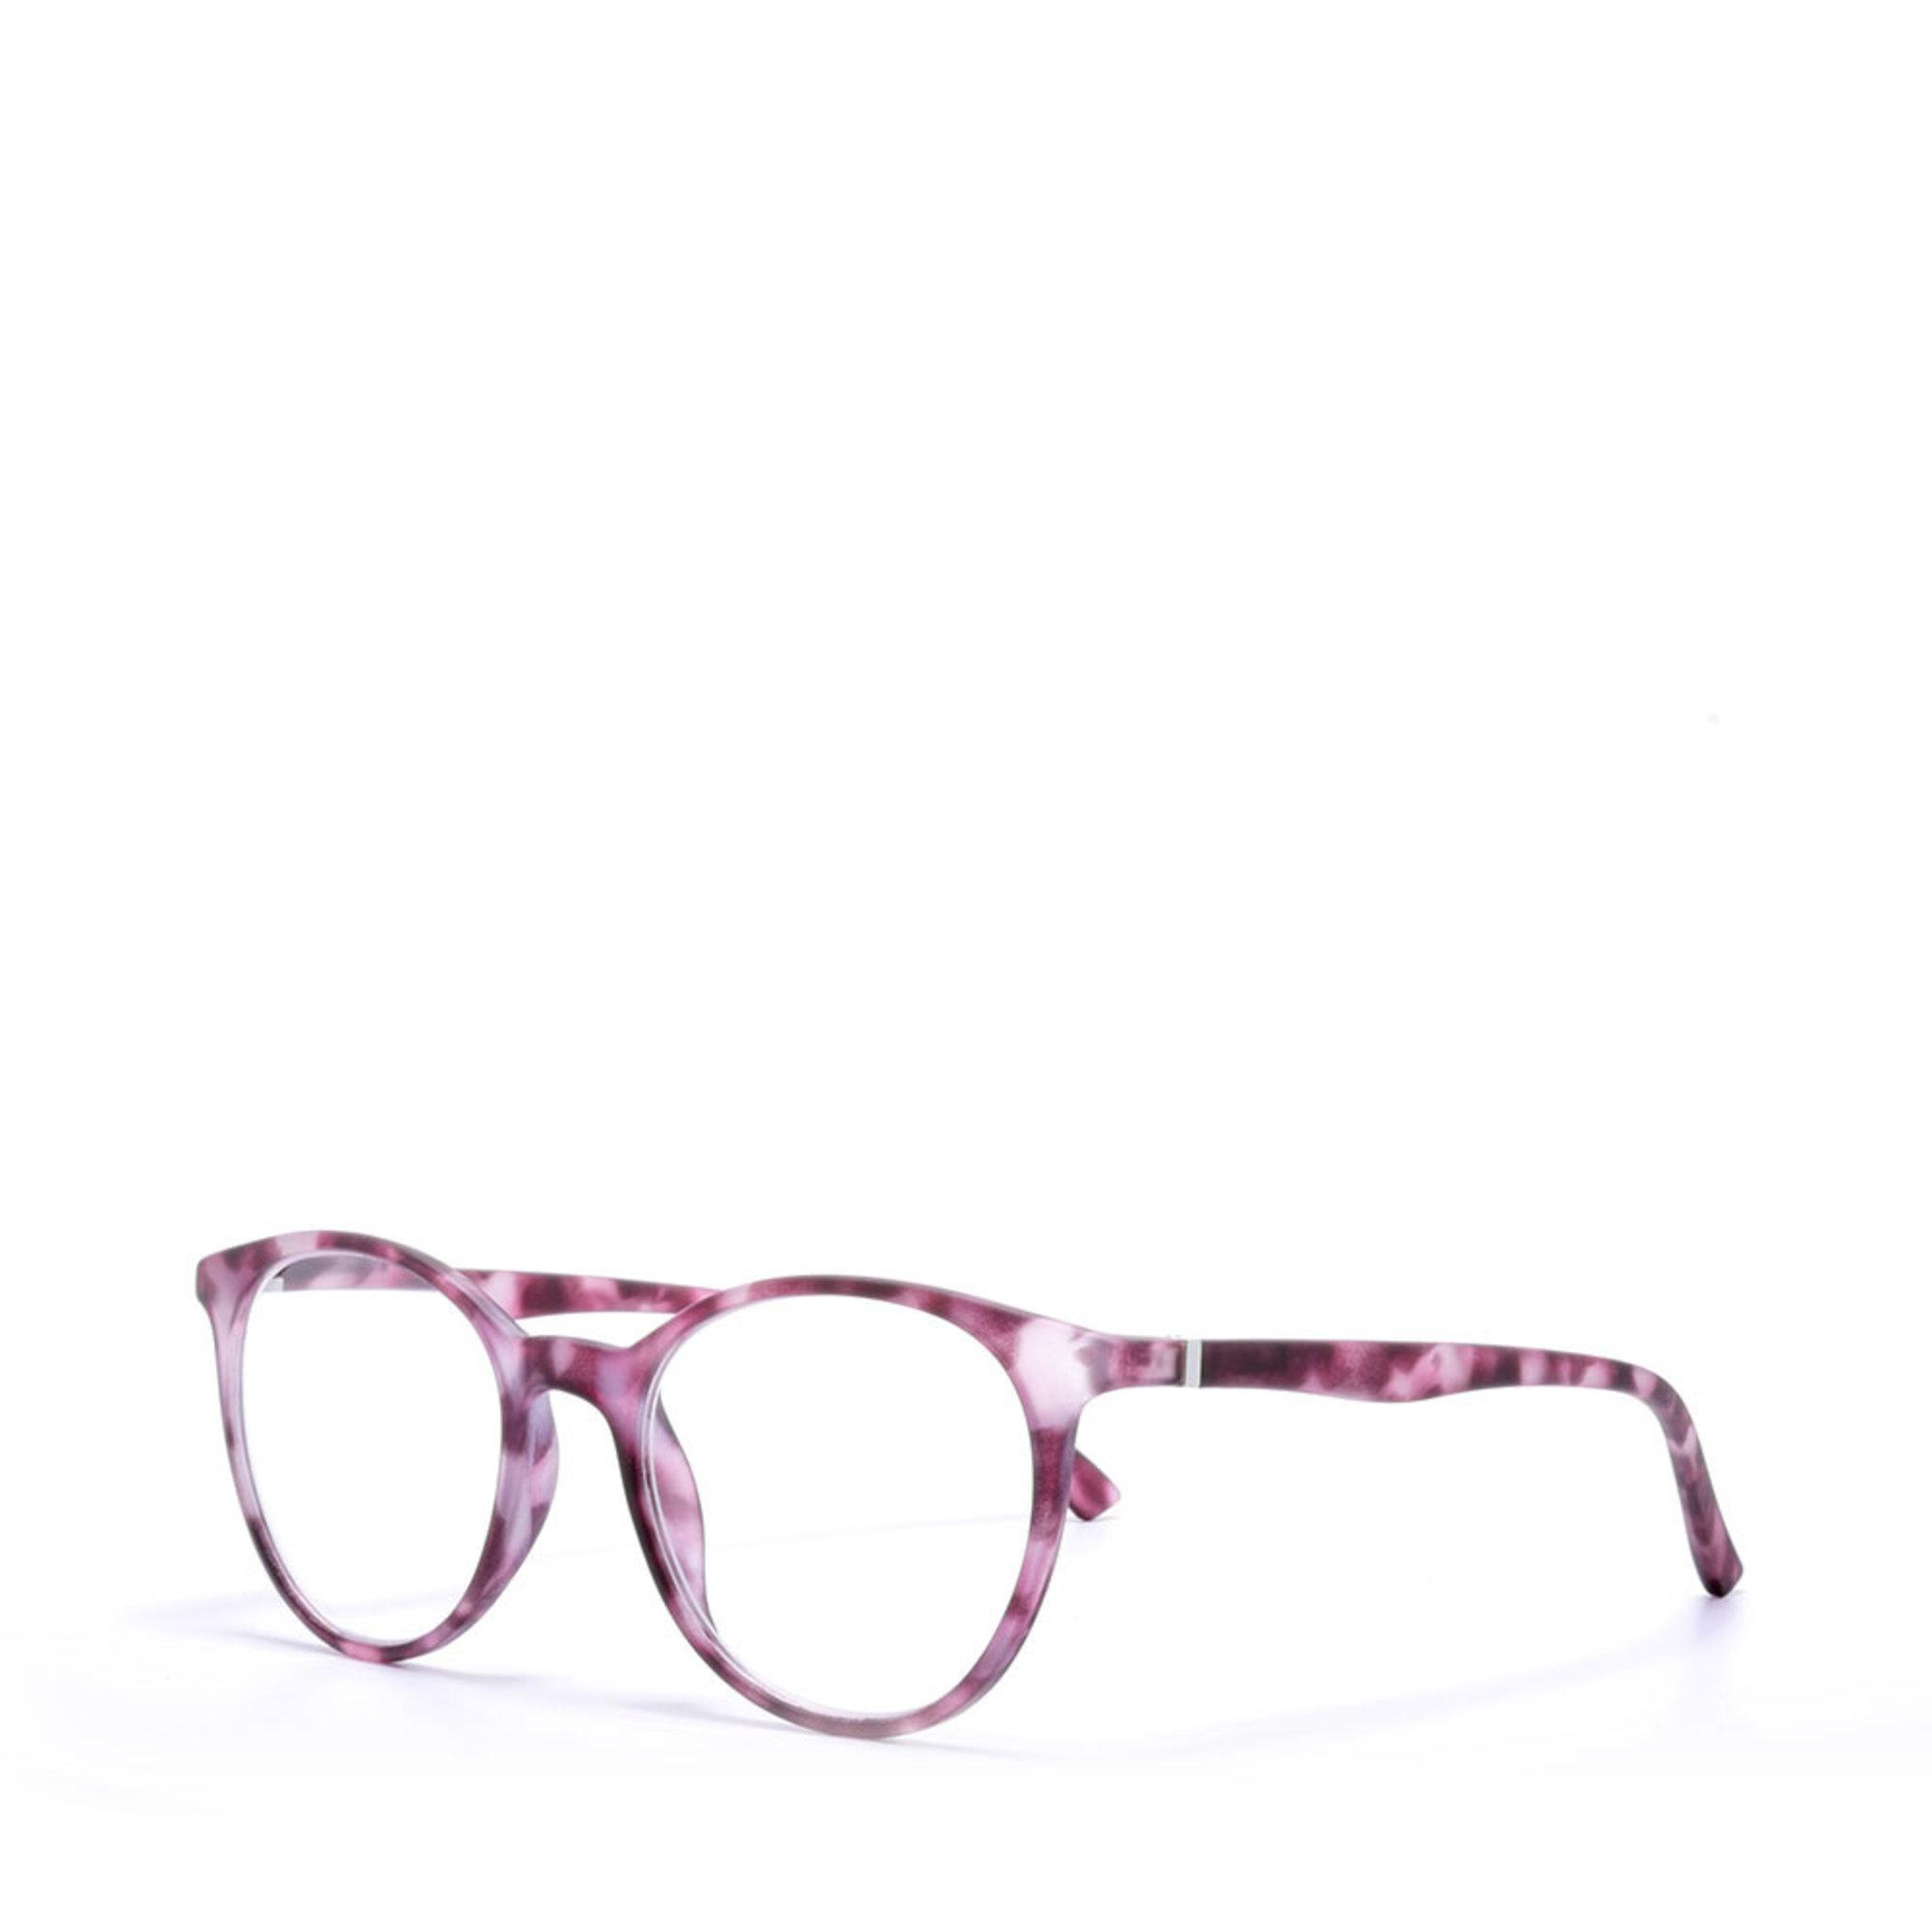 Demi Pink Reading Glasses, +3